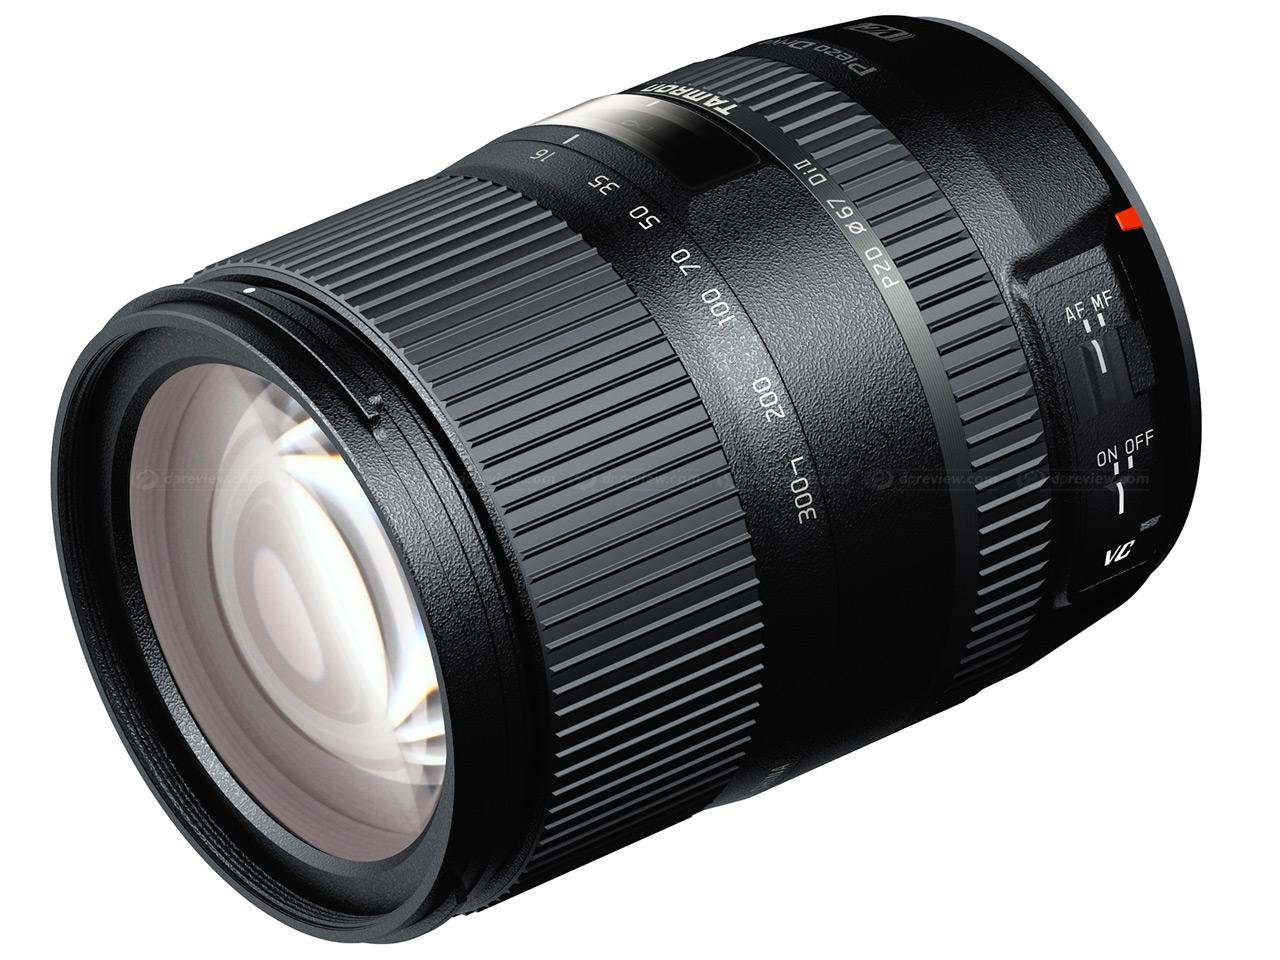 tamron-16-300mm-di-ii-vc-pzd-macro-price-pre-order